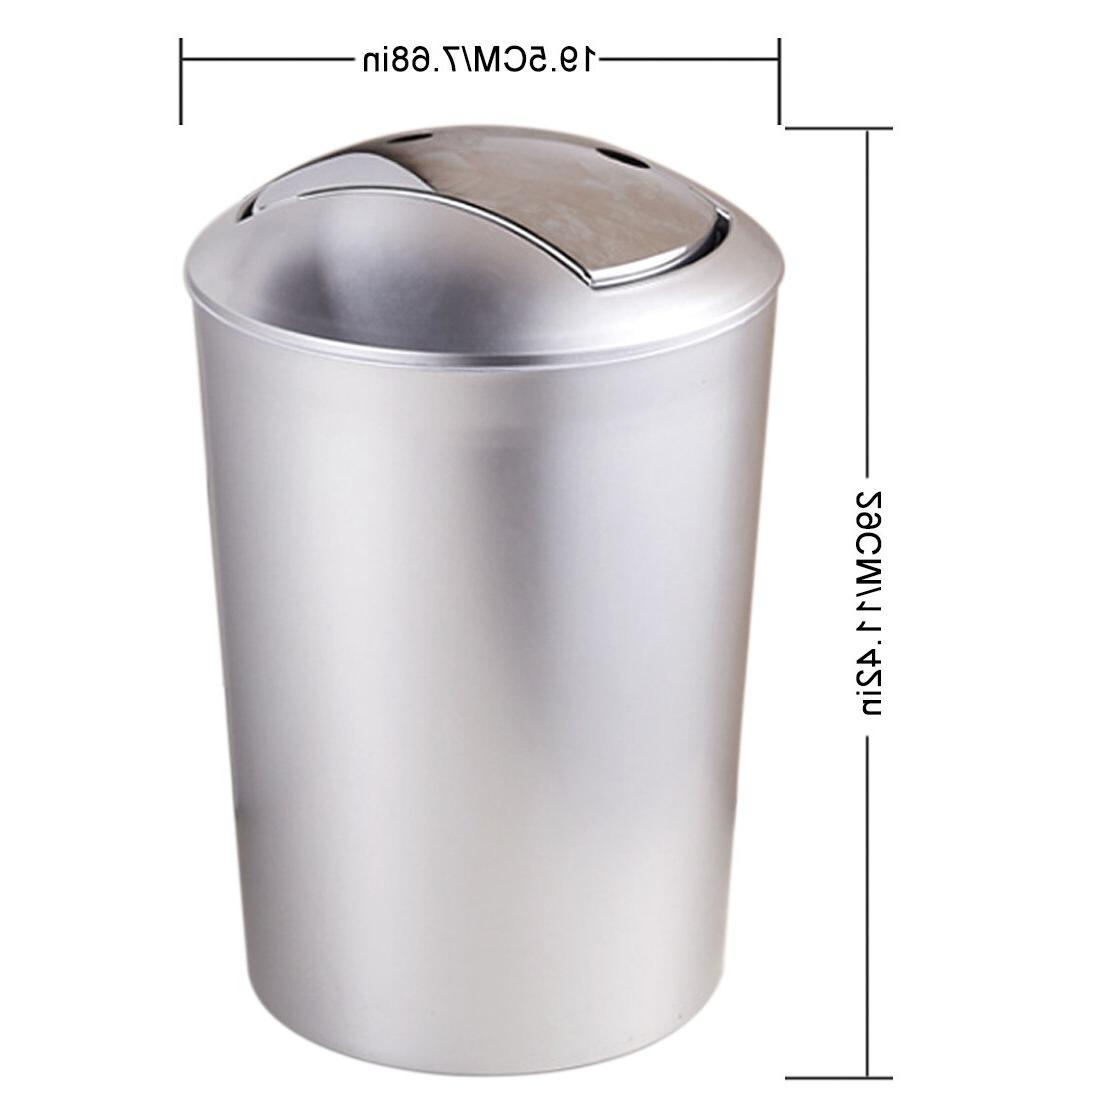 6.5L Bathroom European Style Trash Lid Bin